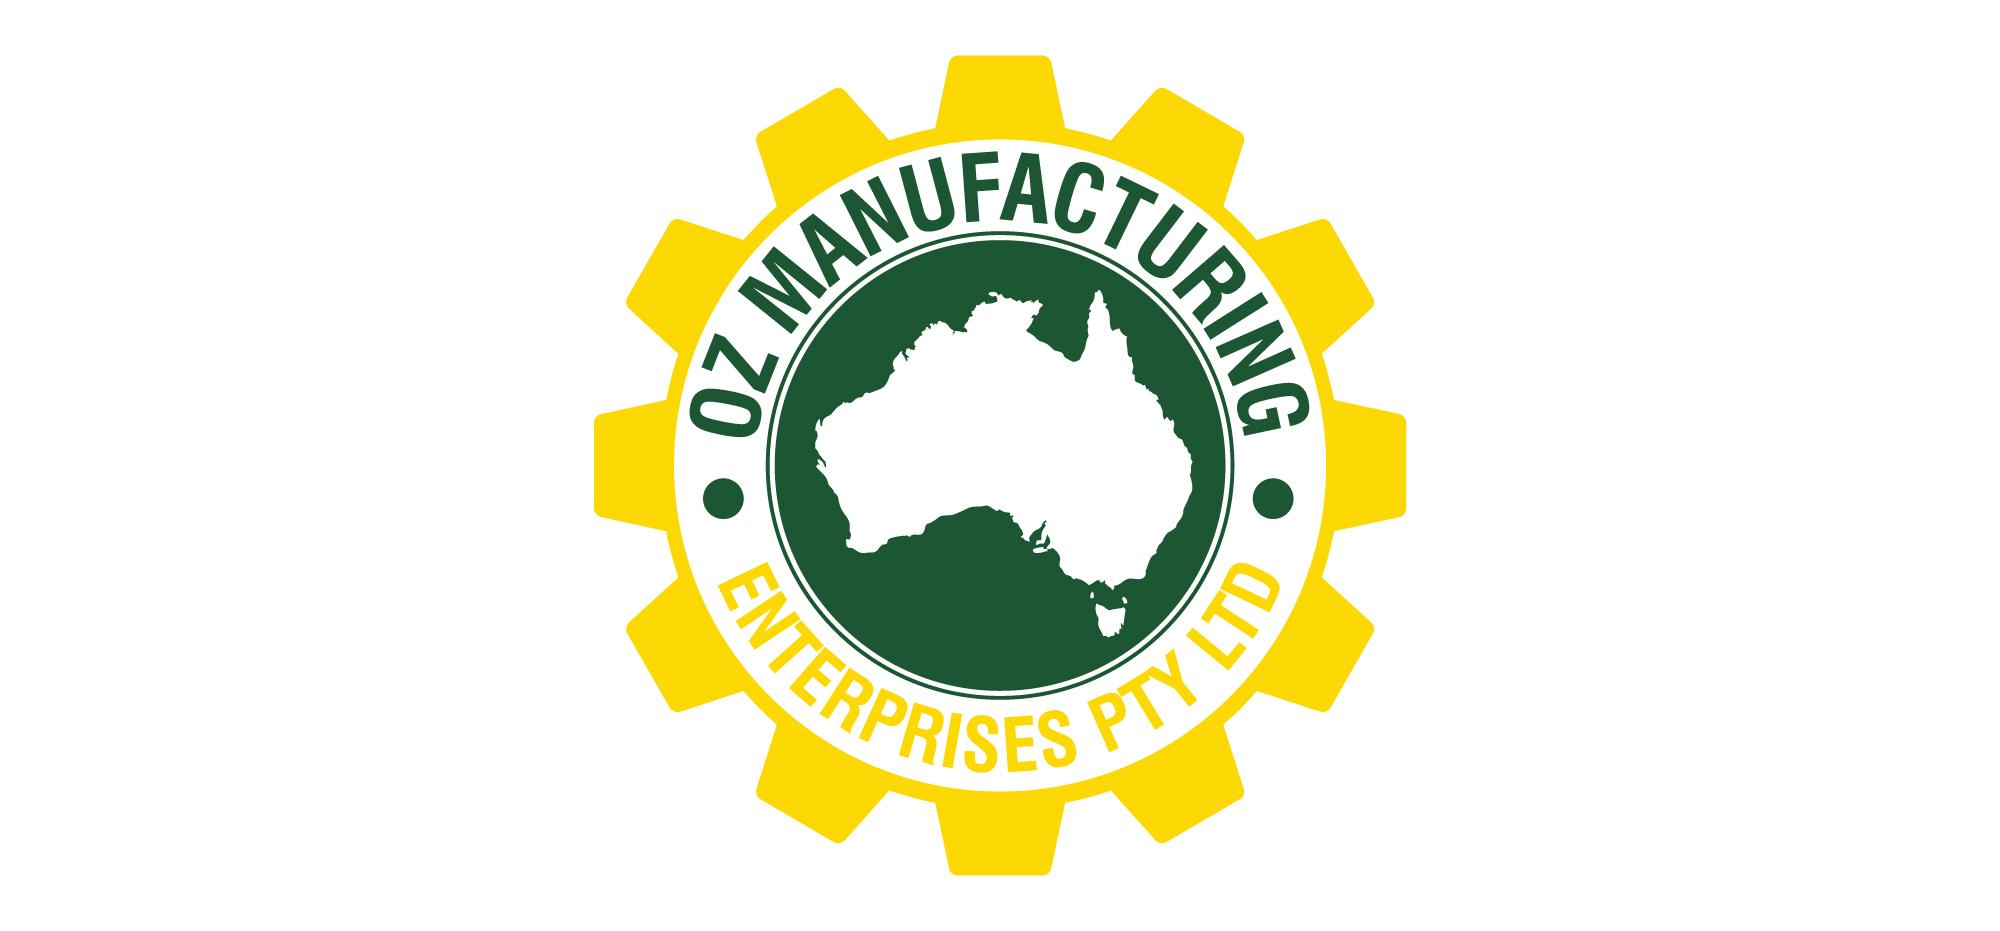 Oz Manufacturing